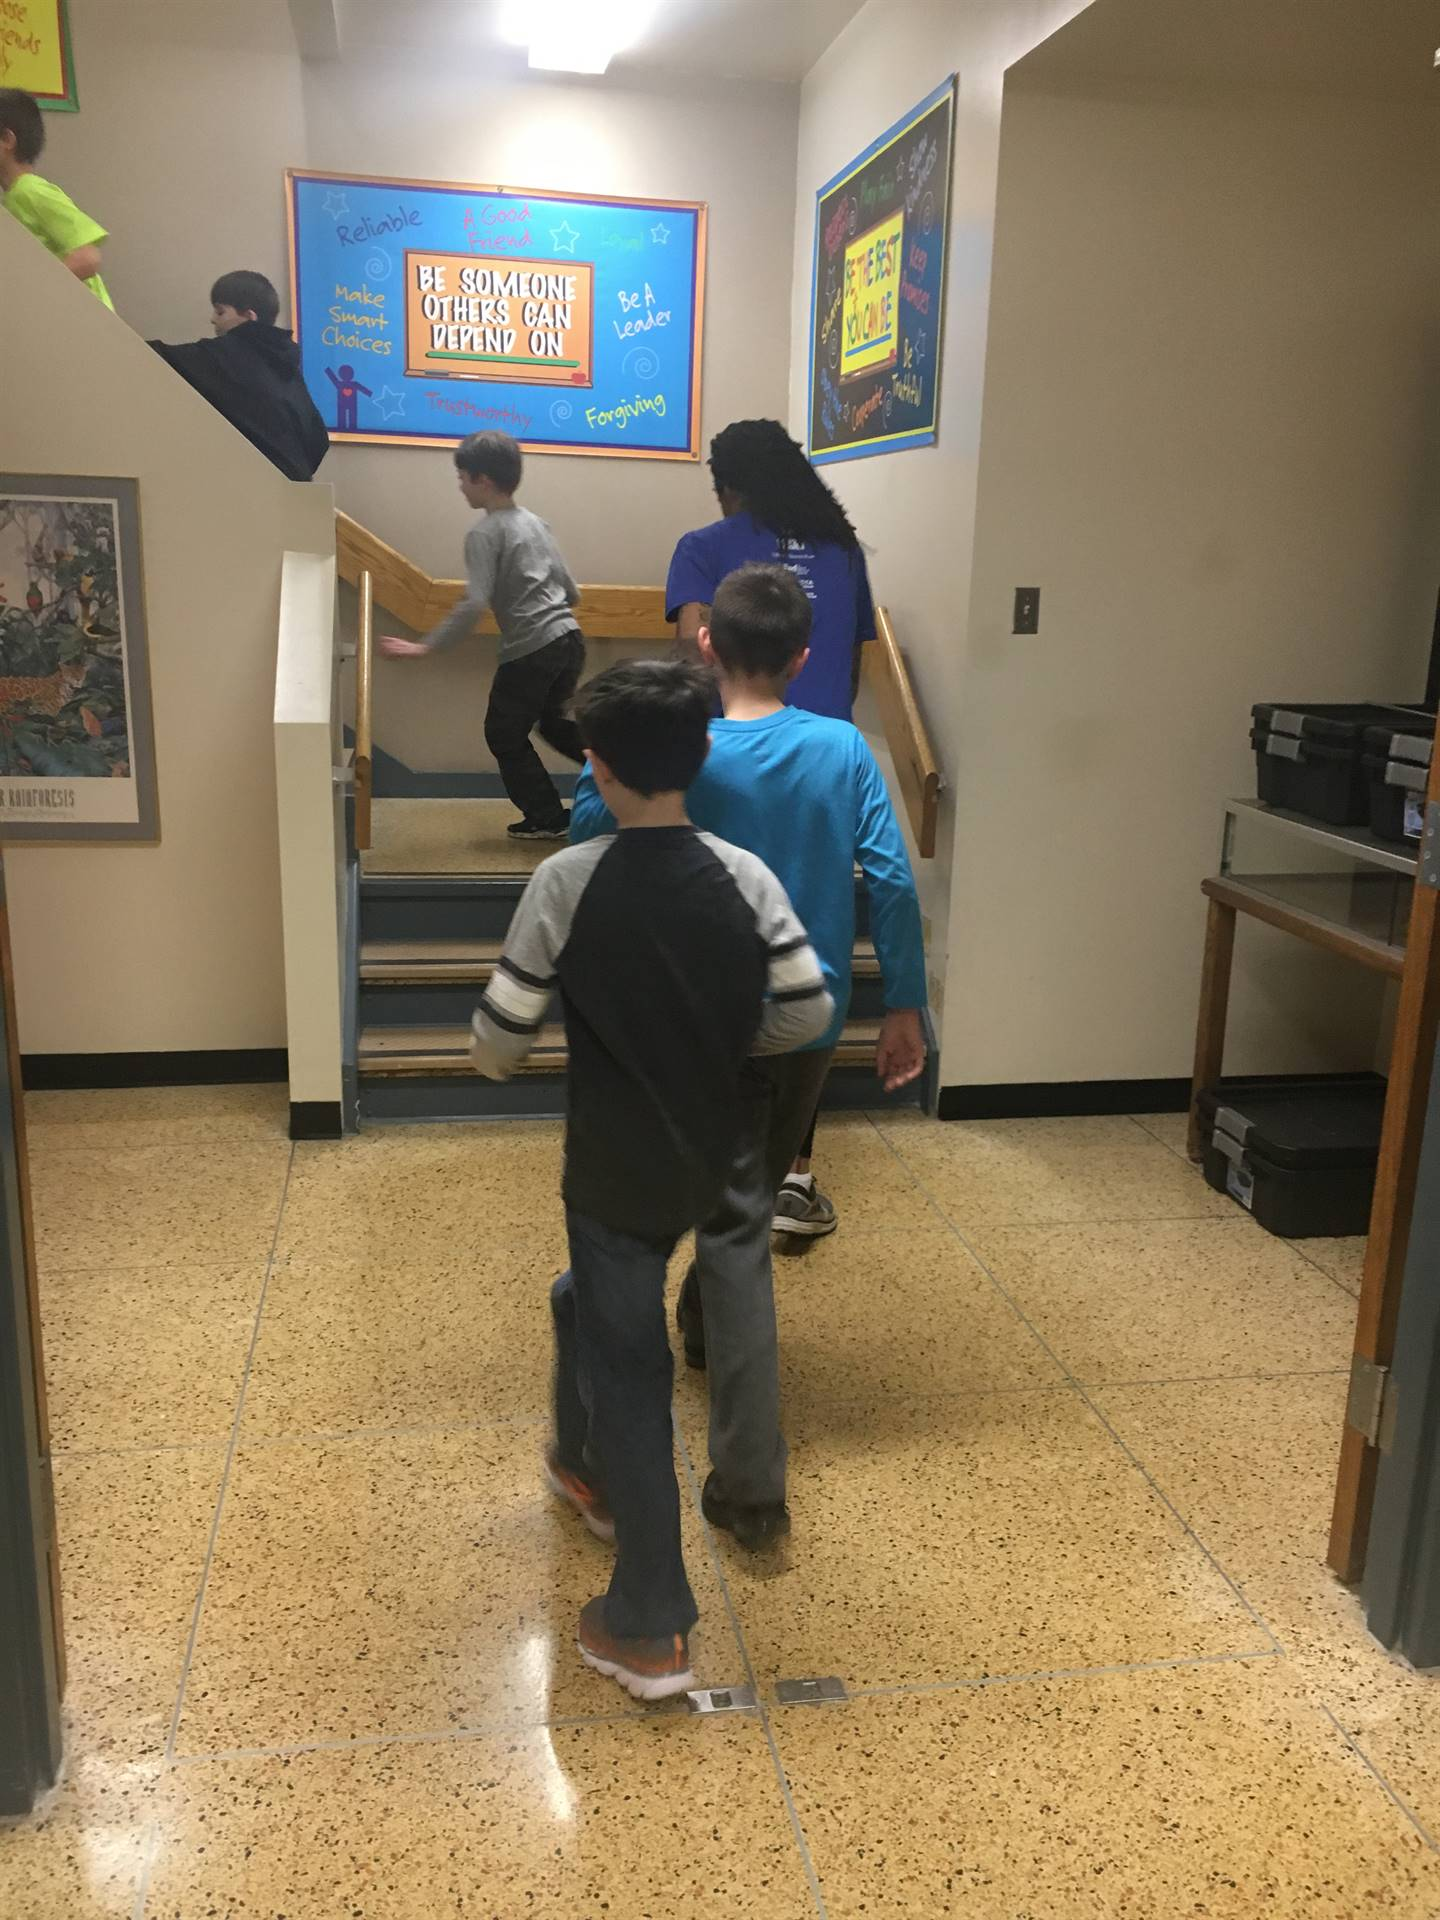 Lincoln students walking upstairs